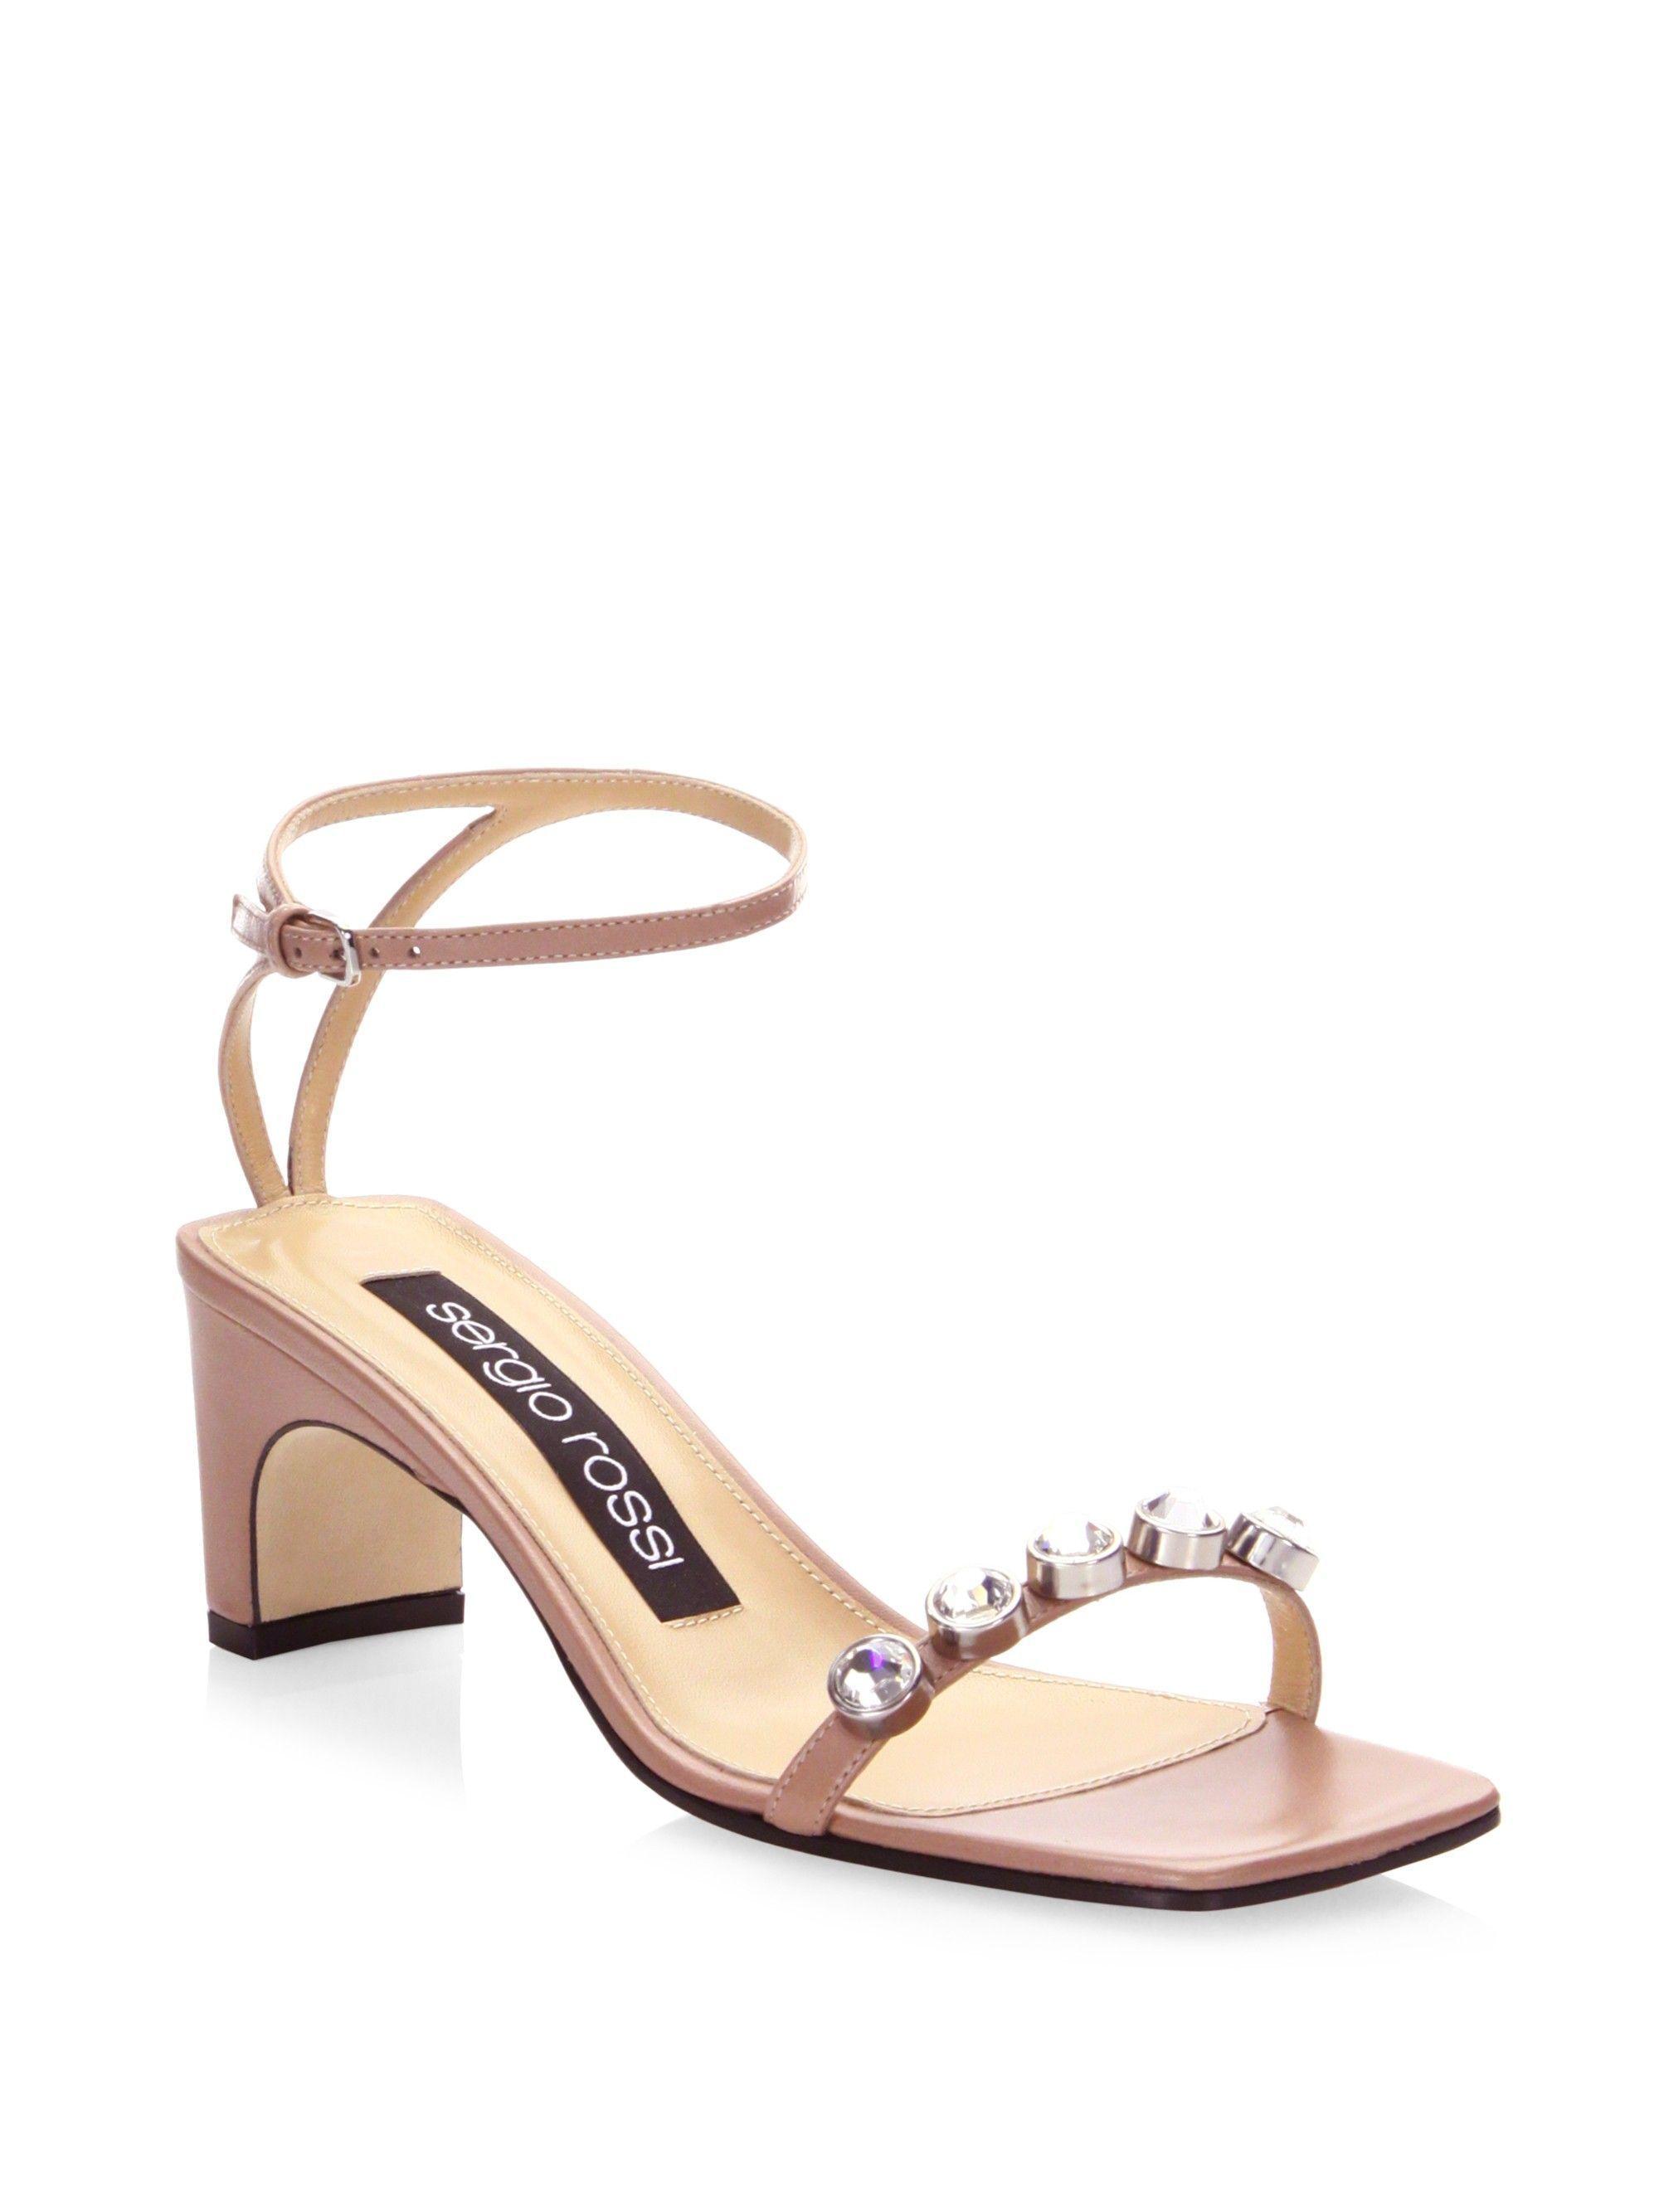 1669ff45e3d59 Sergio Rossi Embellished Leather Ankle-Strap Sandals - Ultraviolet 39 (9)   SergioRossi